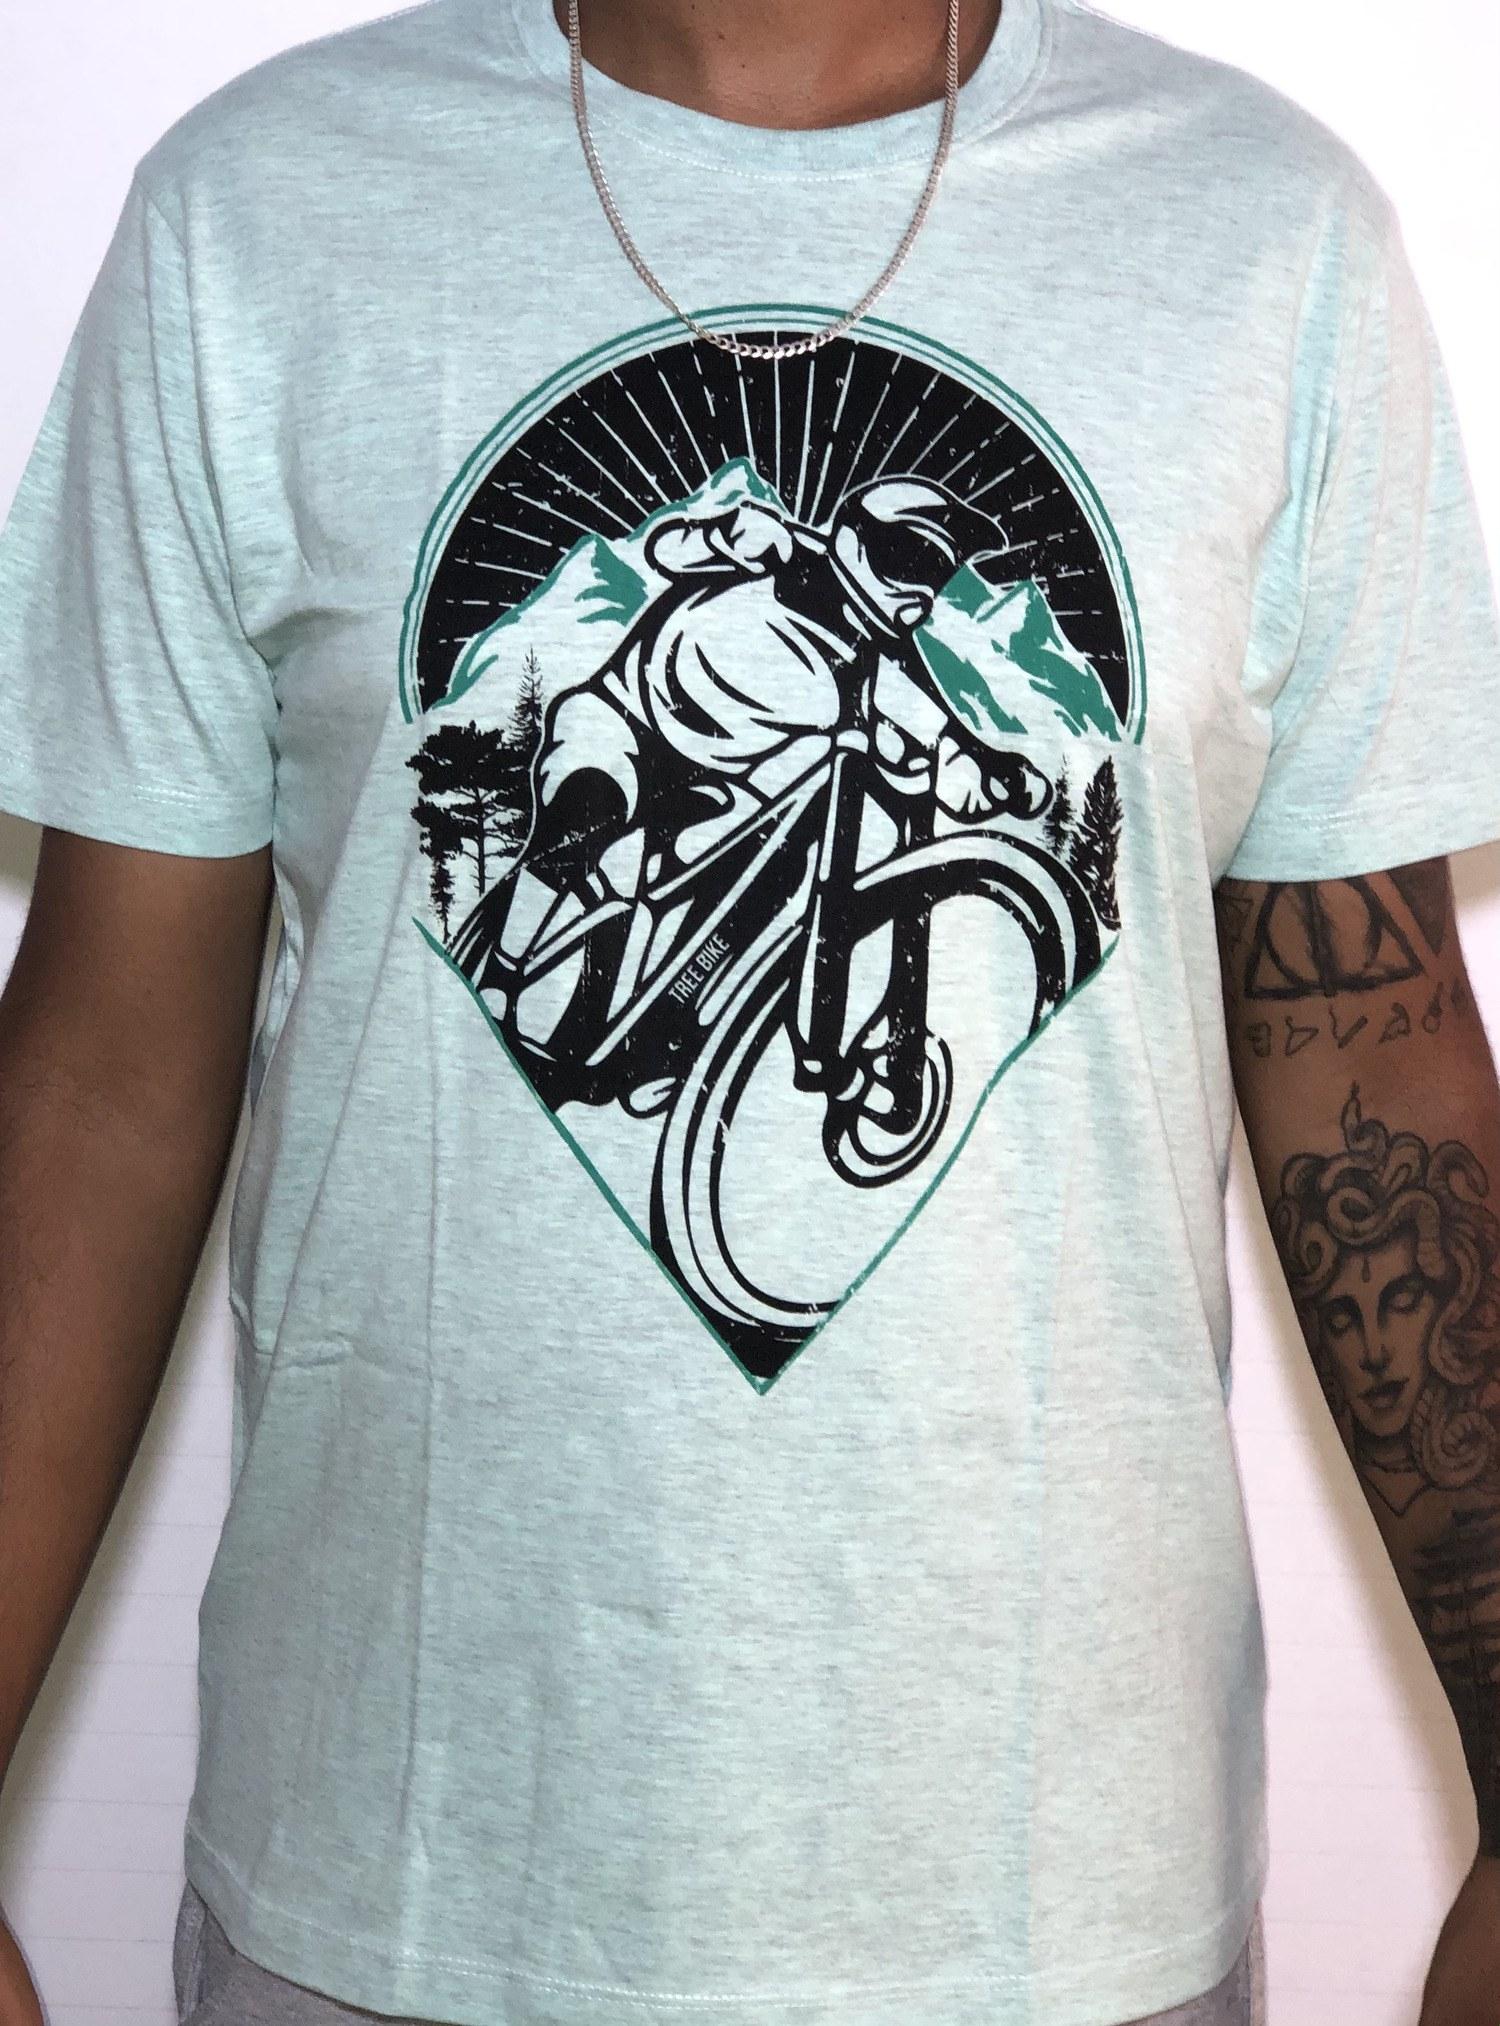 Camiseta Básica - Downhill  - Cod 018